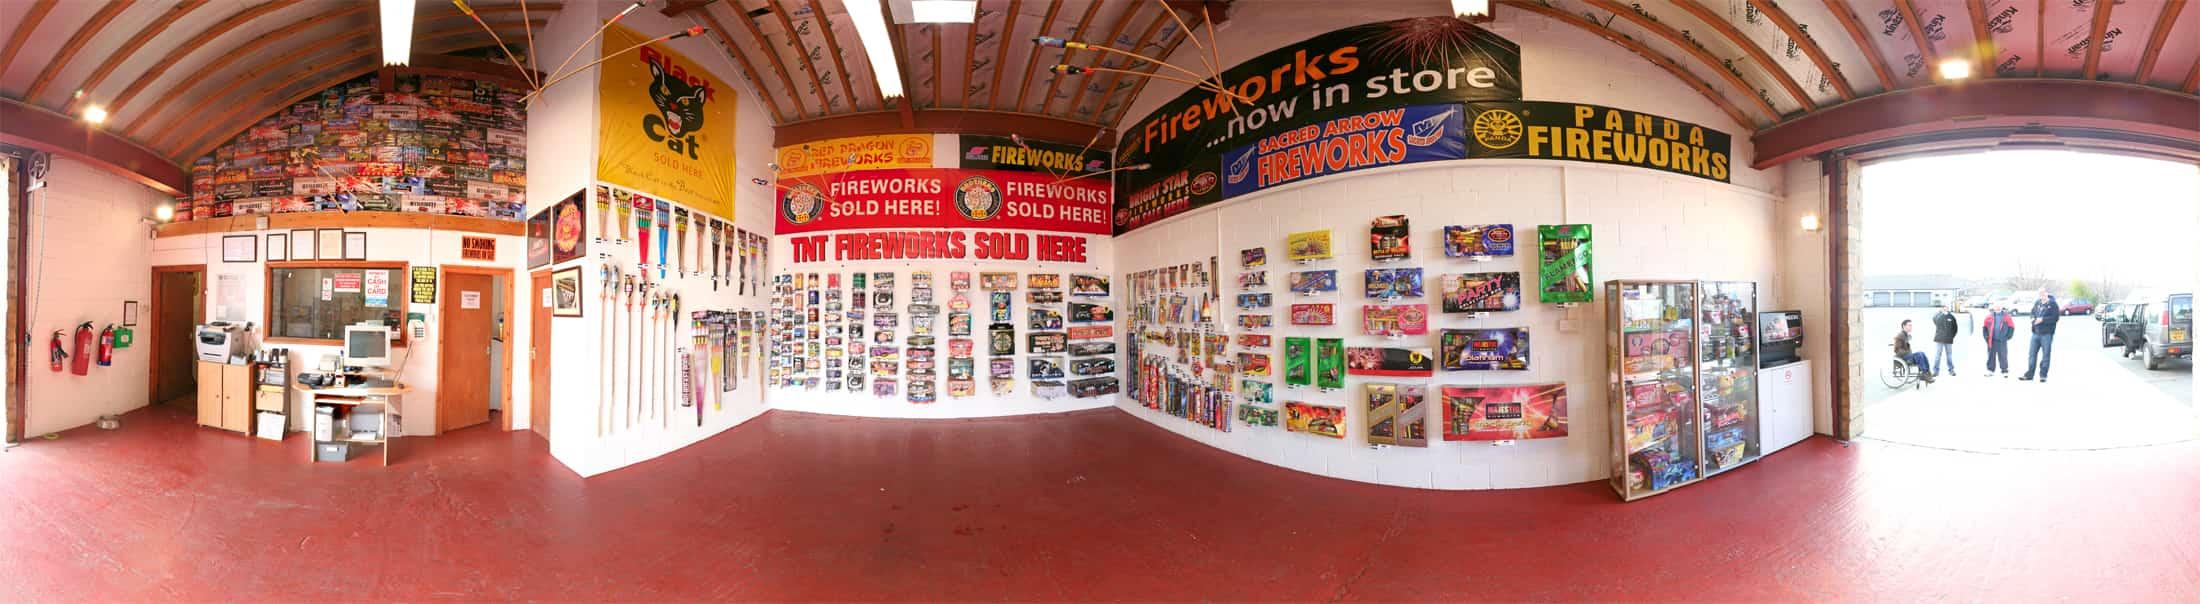 Epic Fireworks Batley Showroom 360 View